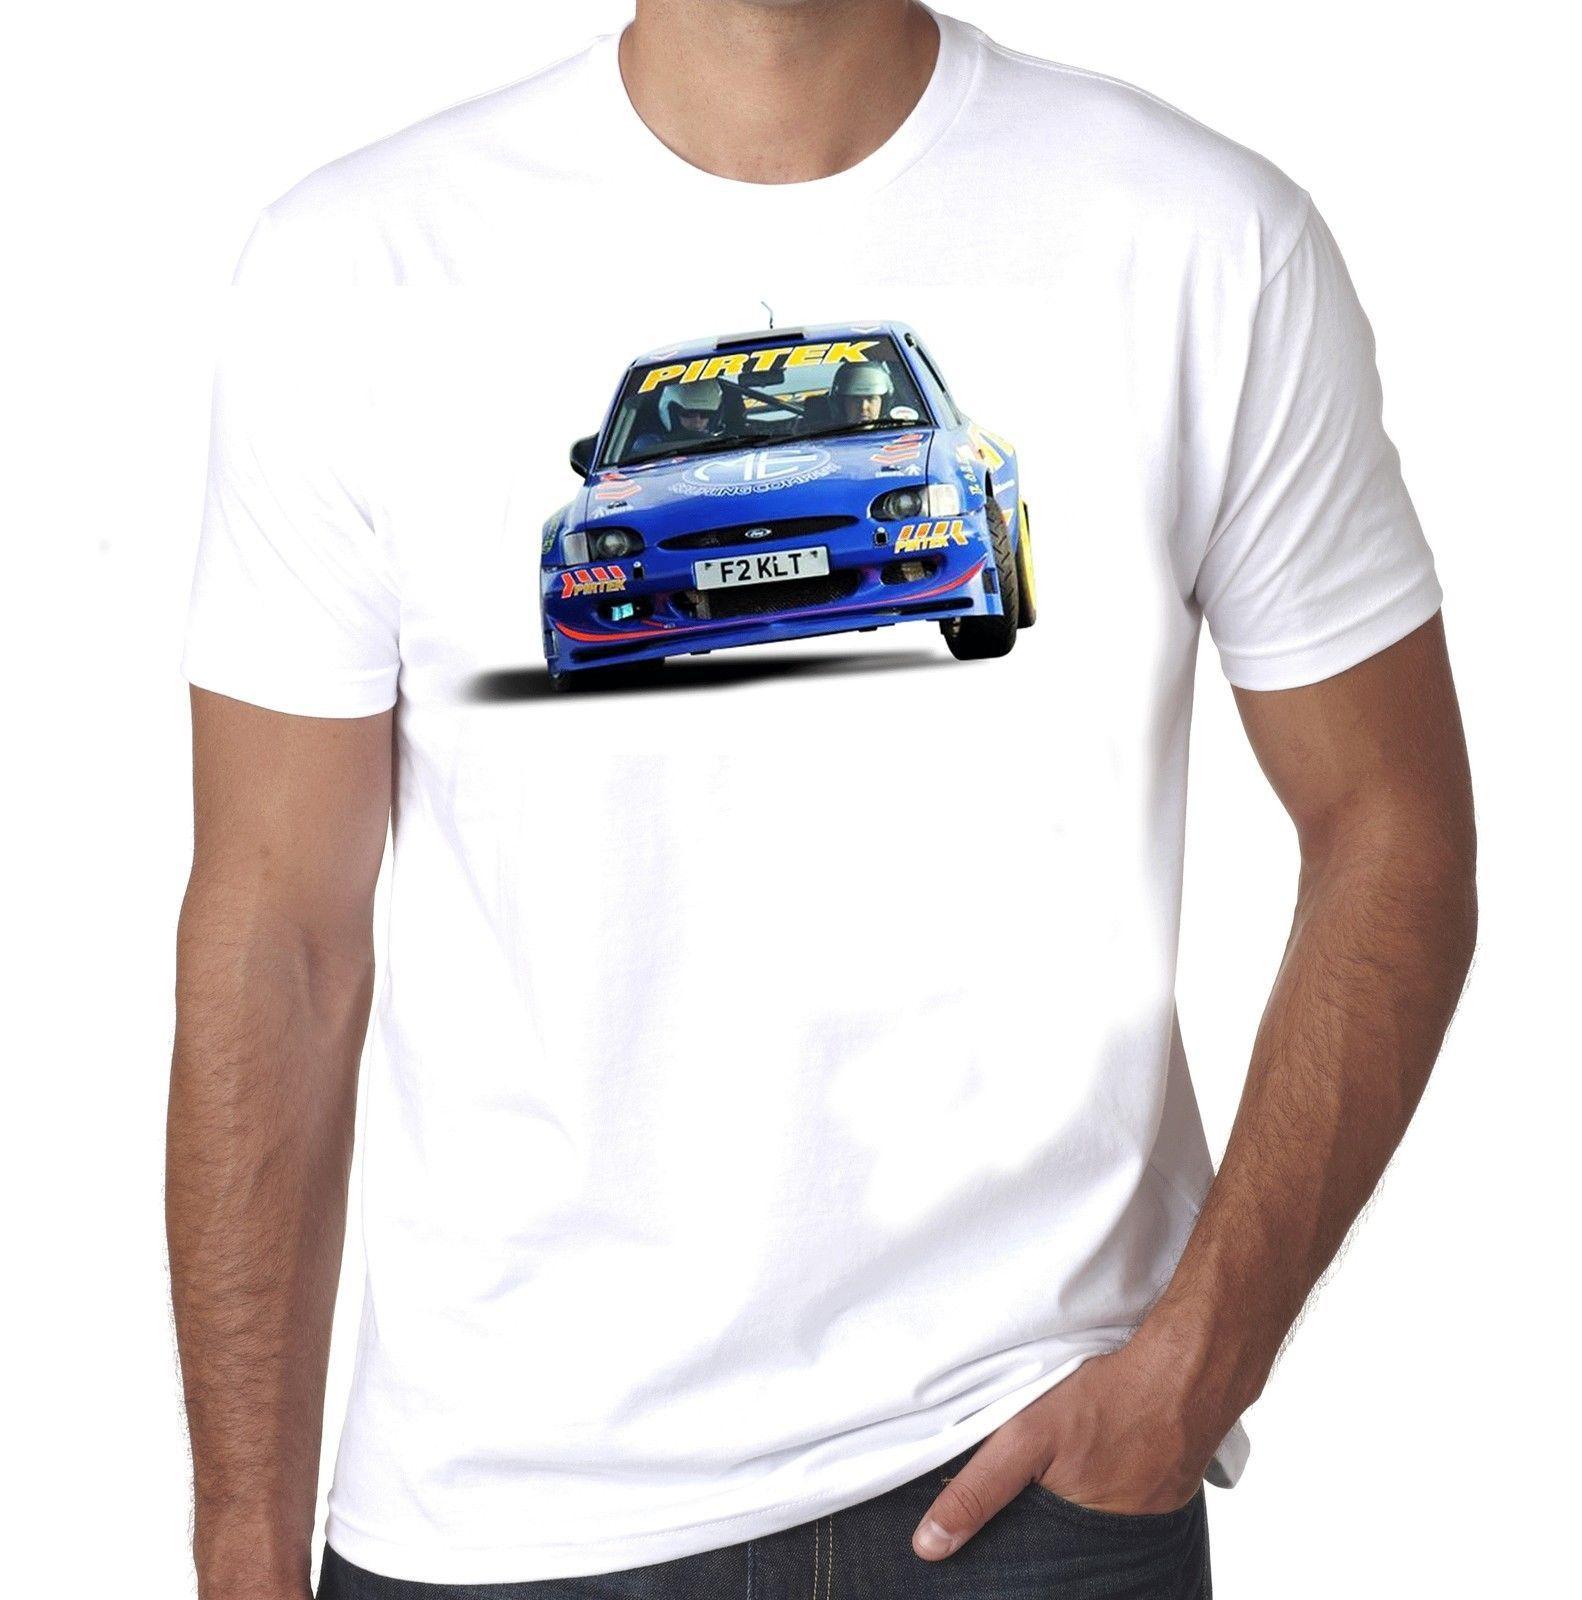 3d496b7bf6 Ford Escort Mk6 Rs2000 F2 Blue Pirtek Maxi Rally No Logo 100% Cotton Tshirt  Cool Casual Pride T Shirt Men Unisex T Shirt Sale Cool Shirt Designs From  ...